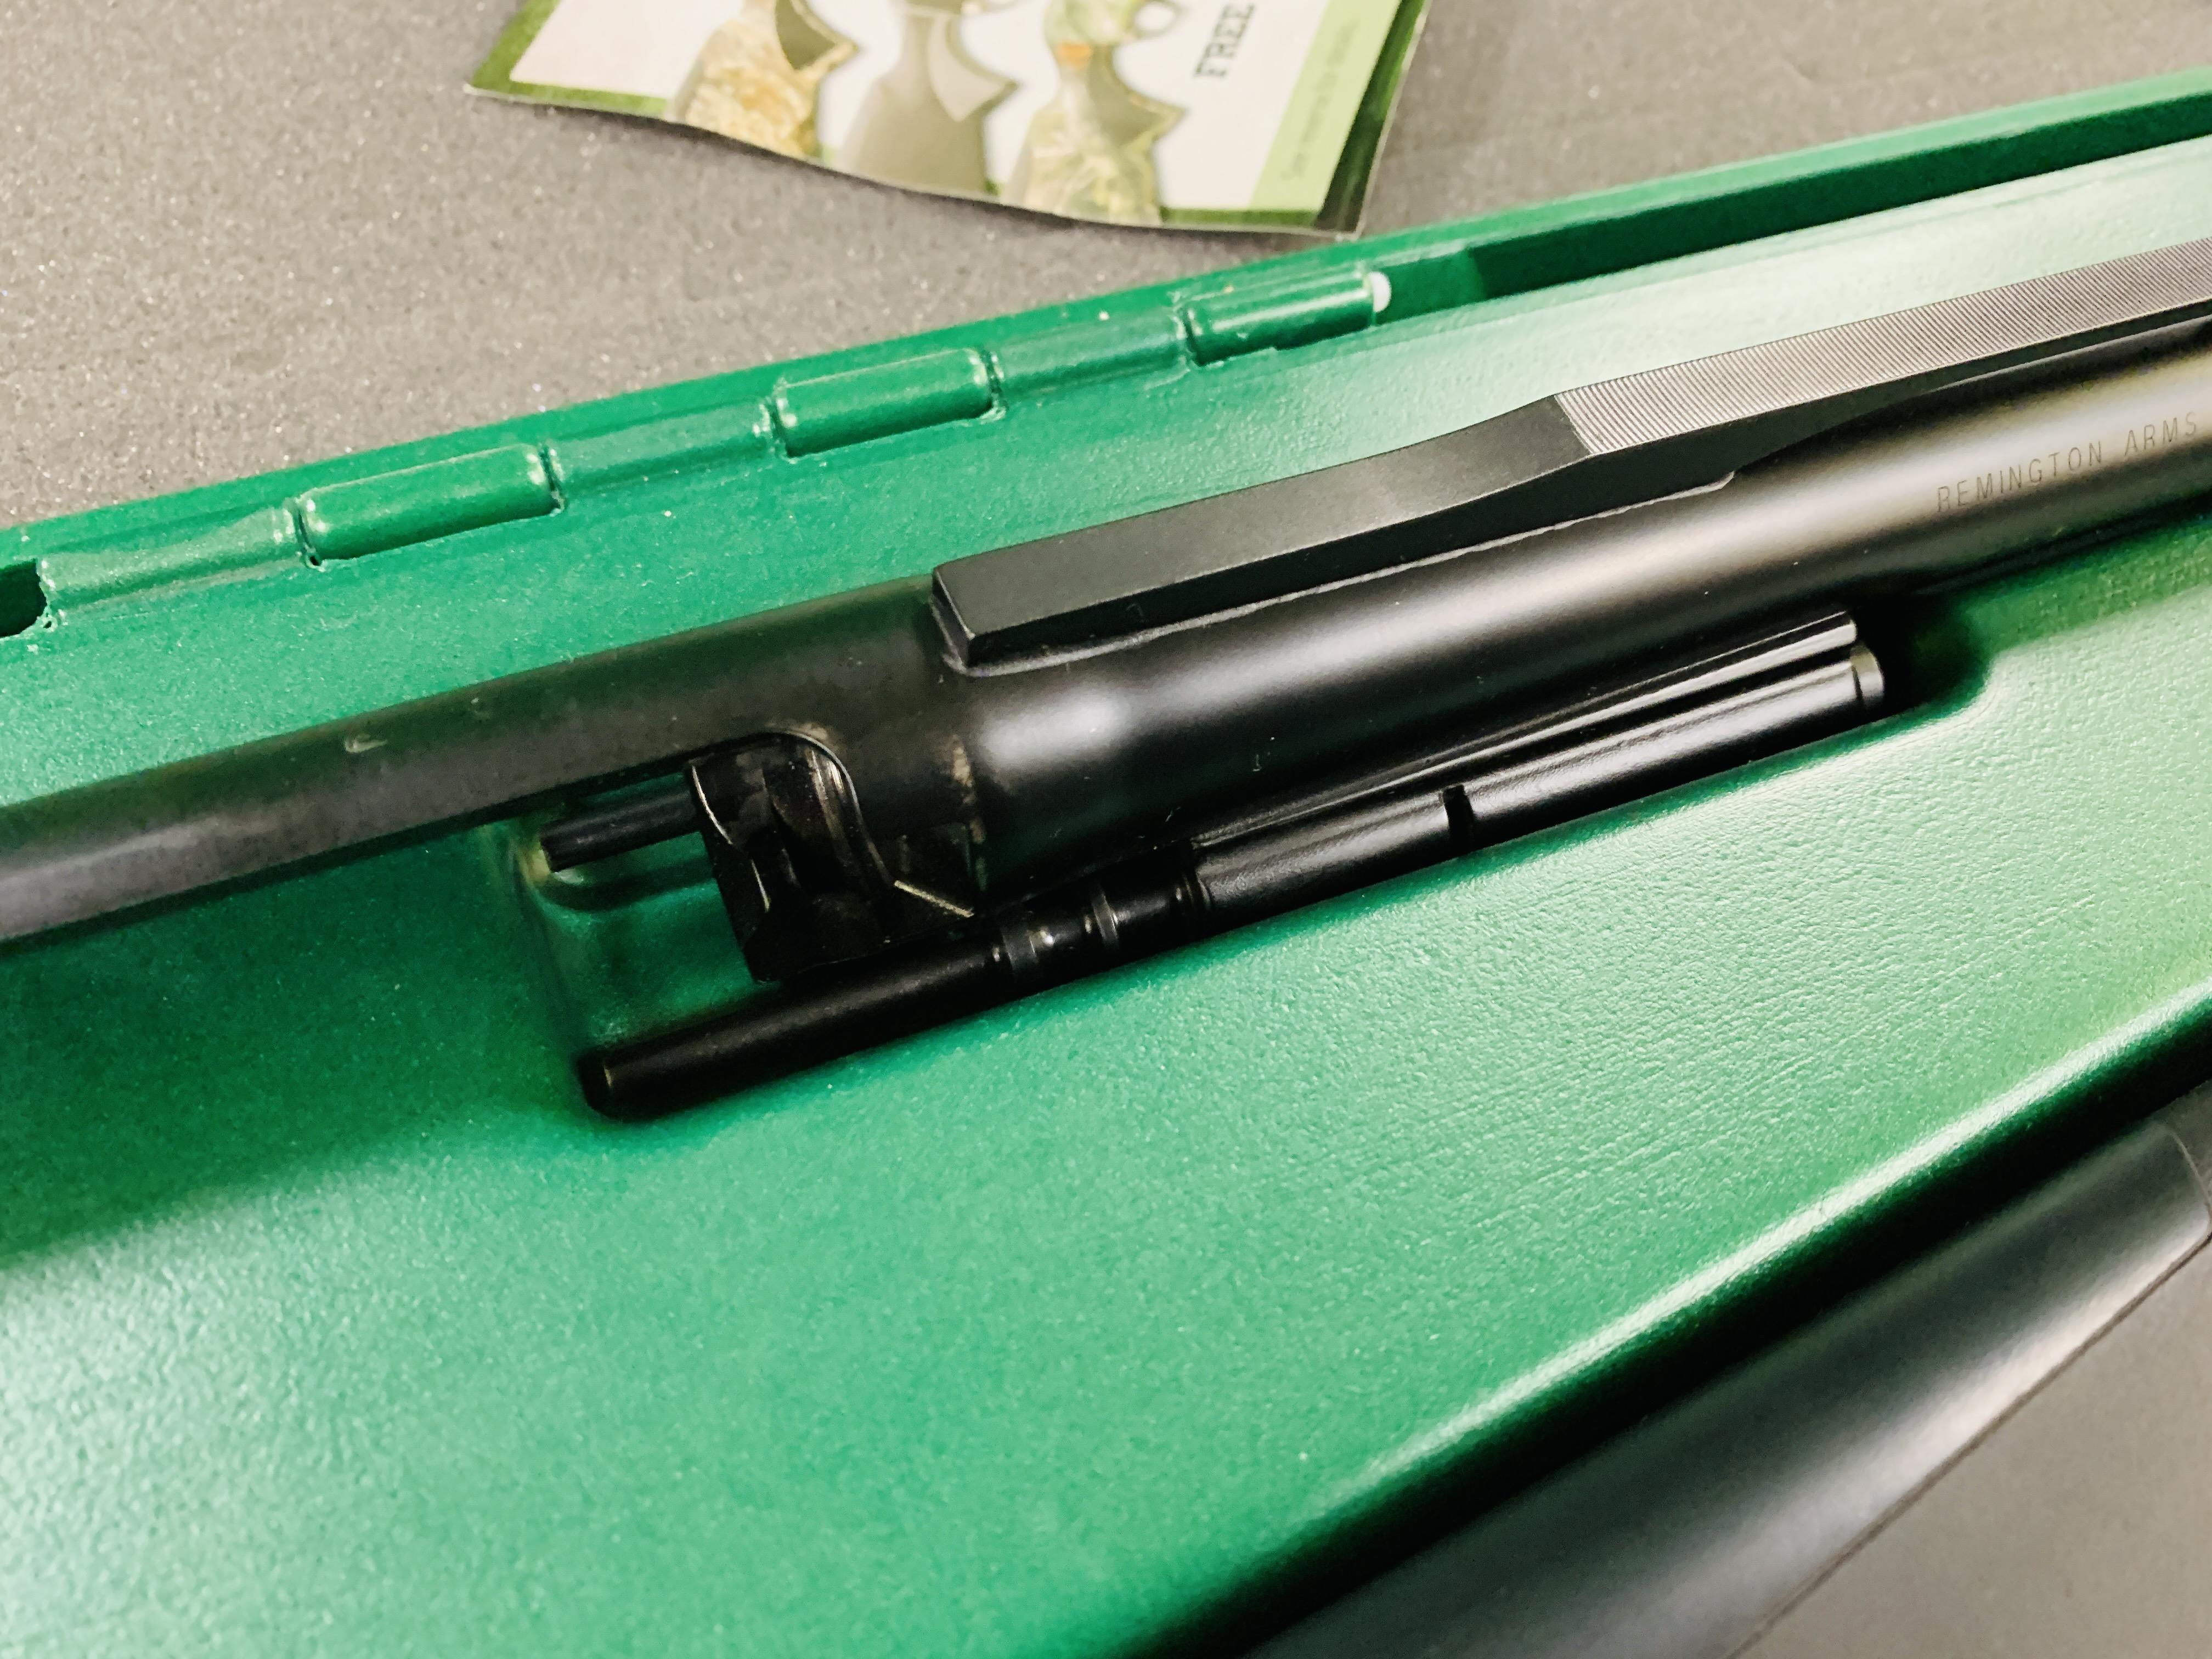 REMINGTON VERSA MAX 12 GAUGE SEMI-AUTO SHOTGUN 2¾ - 3½ CHOKE, - Image 8 of 13